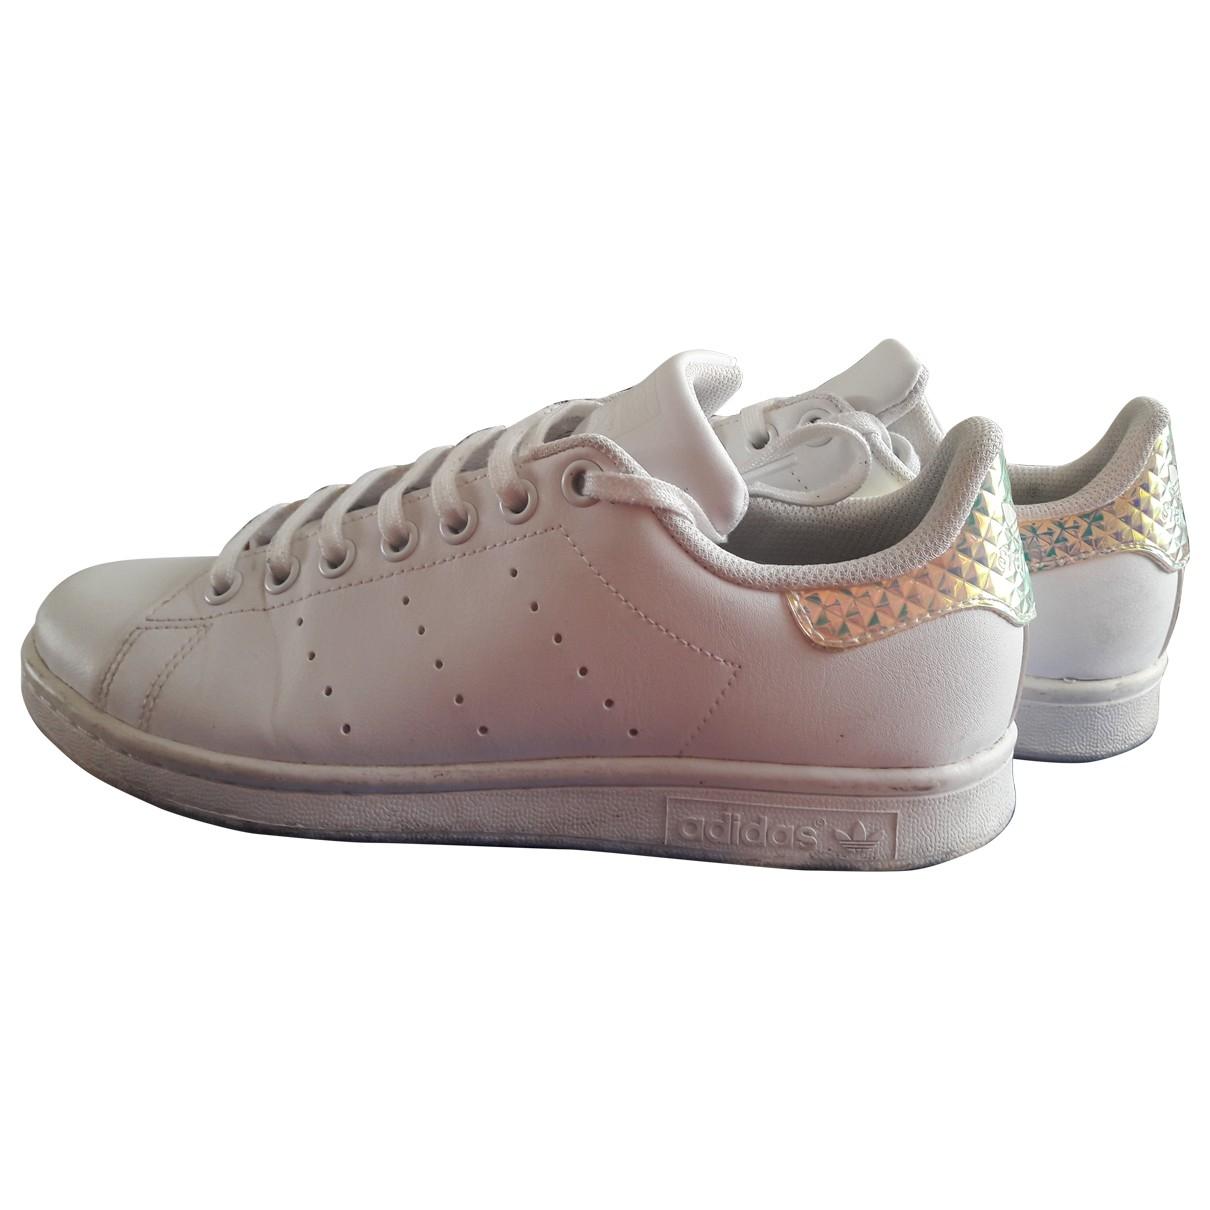 Adidas Stan Smith White Leather Trainers for Women 38 EU